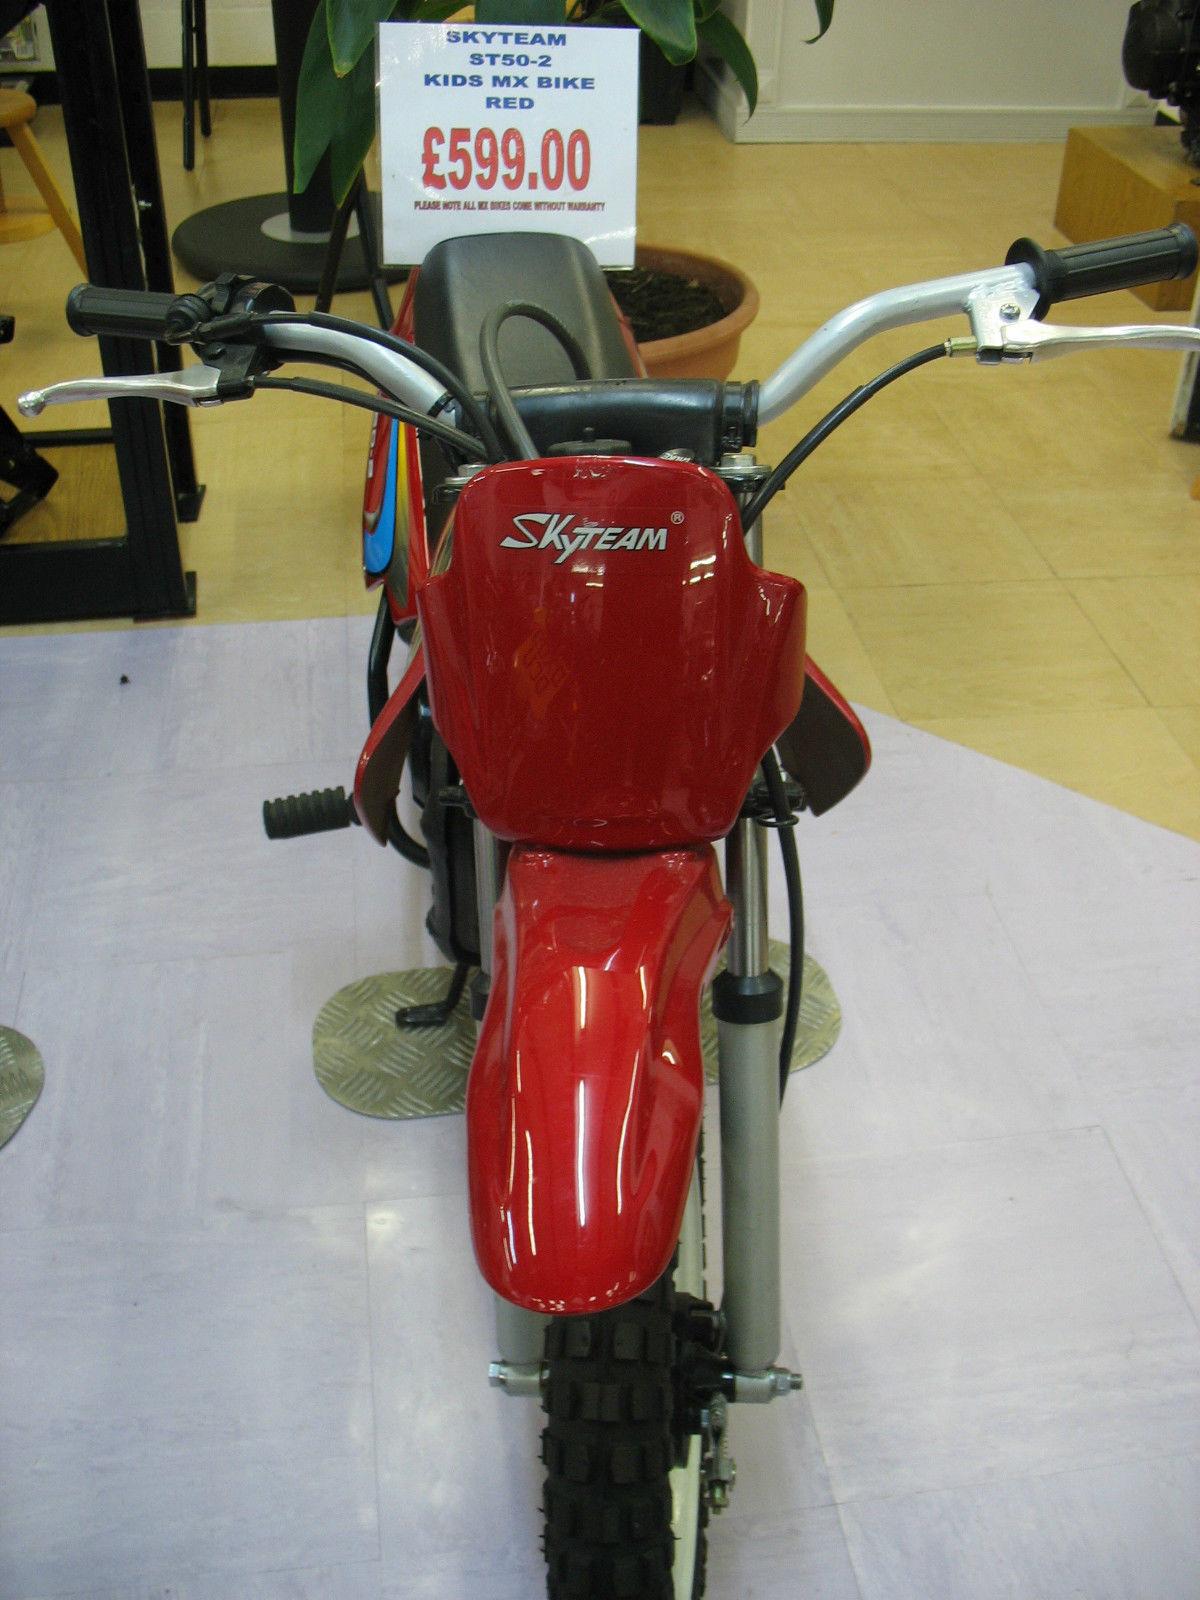 MX BIKE KIDS OFF ROAD BIKE BRAND NEW FOR CHRISTMAS RED 50cc